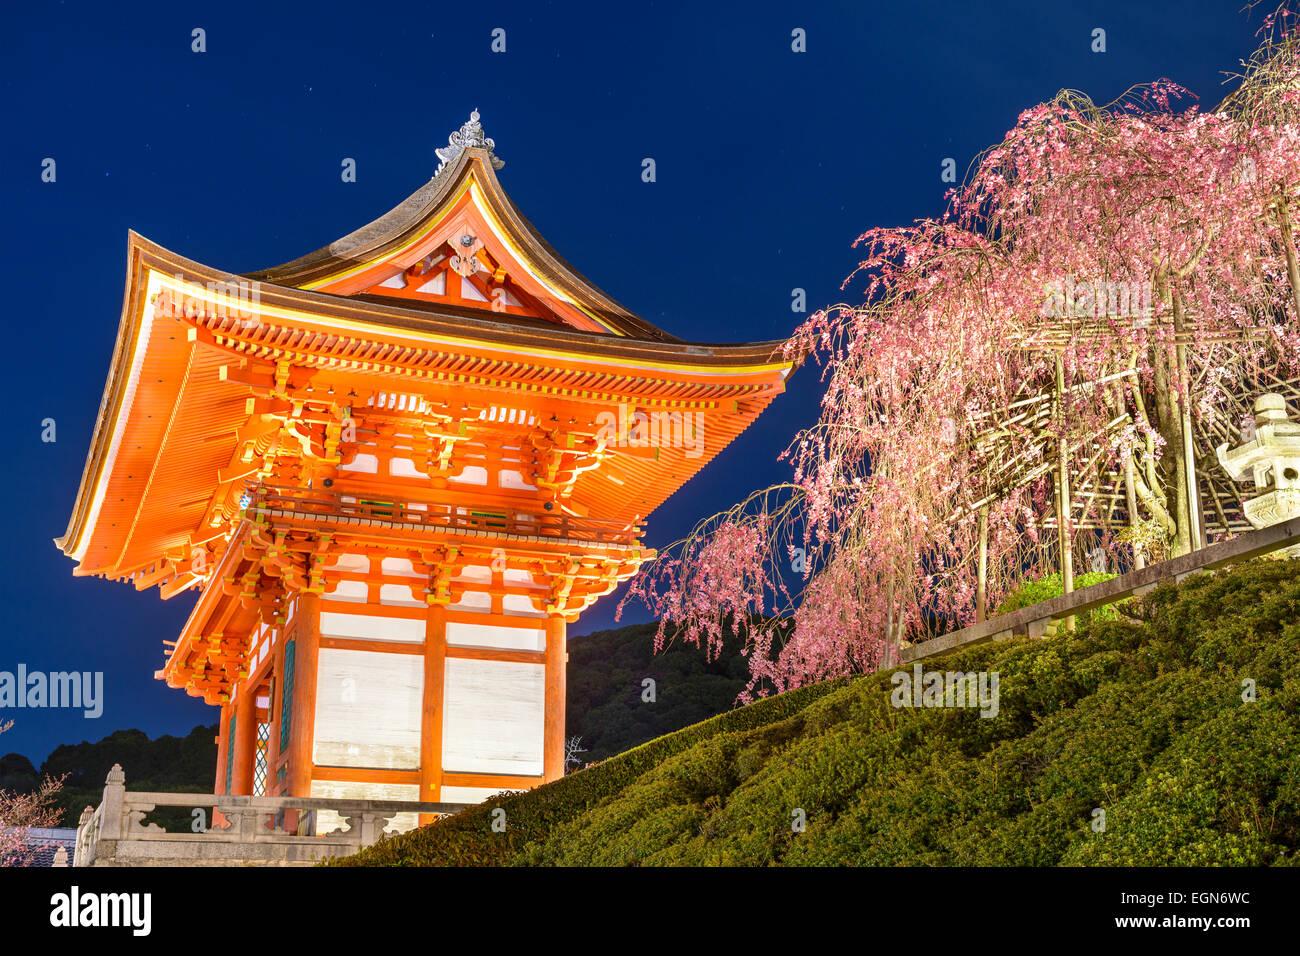 Kyoto, Japan at Kiyomizu-dera Shrine outter gate in the Spring illuminated at night. - Stock Image